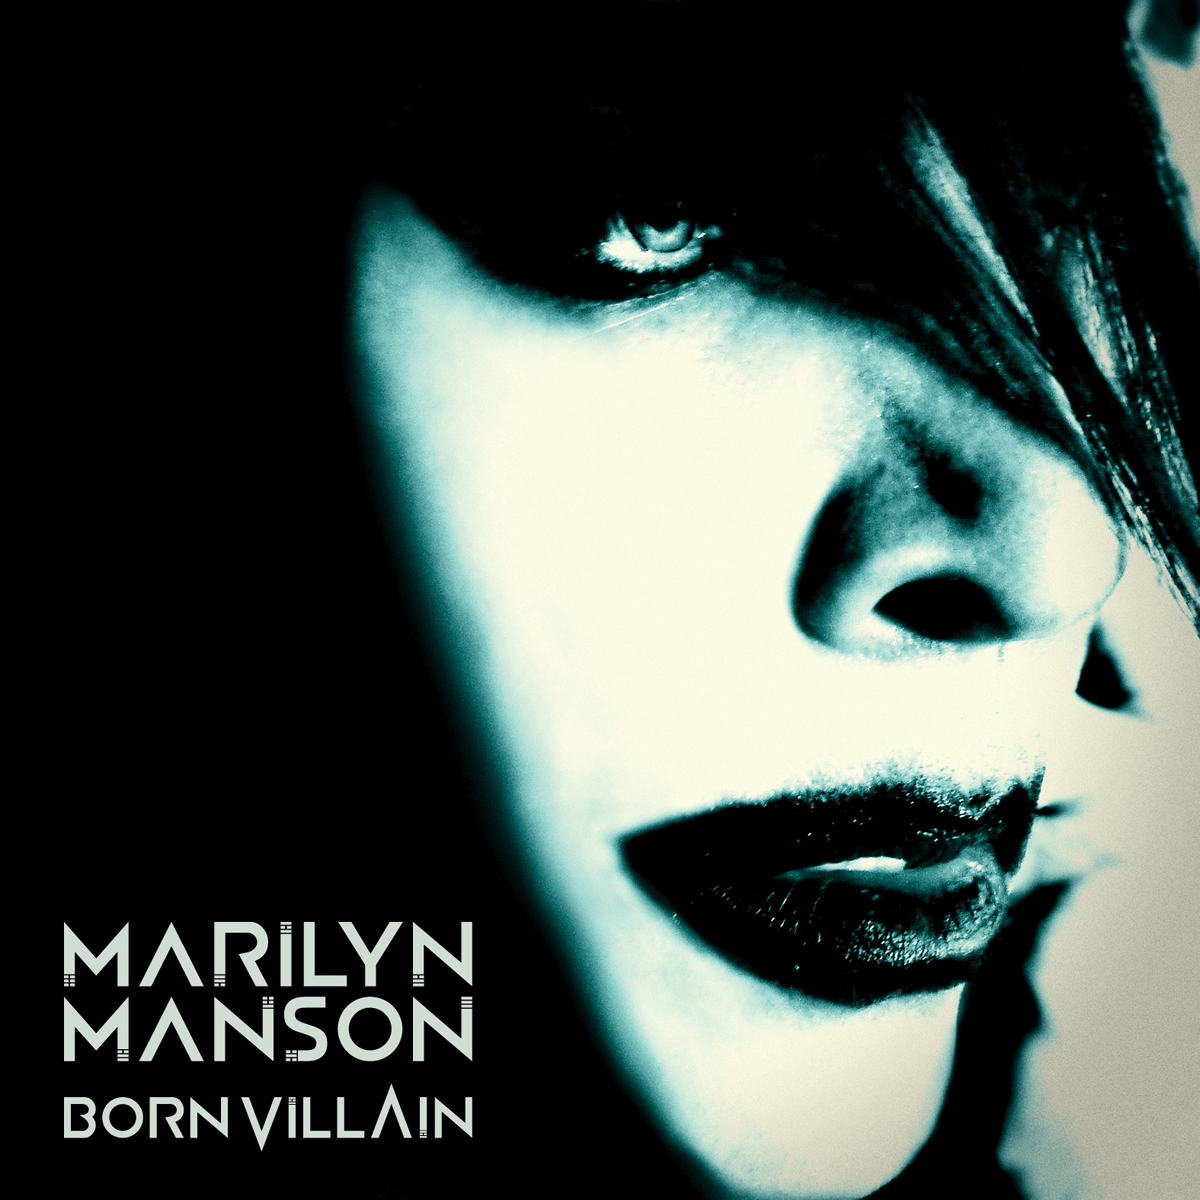 Marilyn Manson: Born Villain (2012) Book Cover